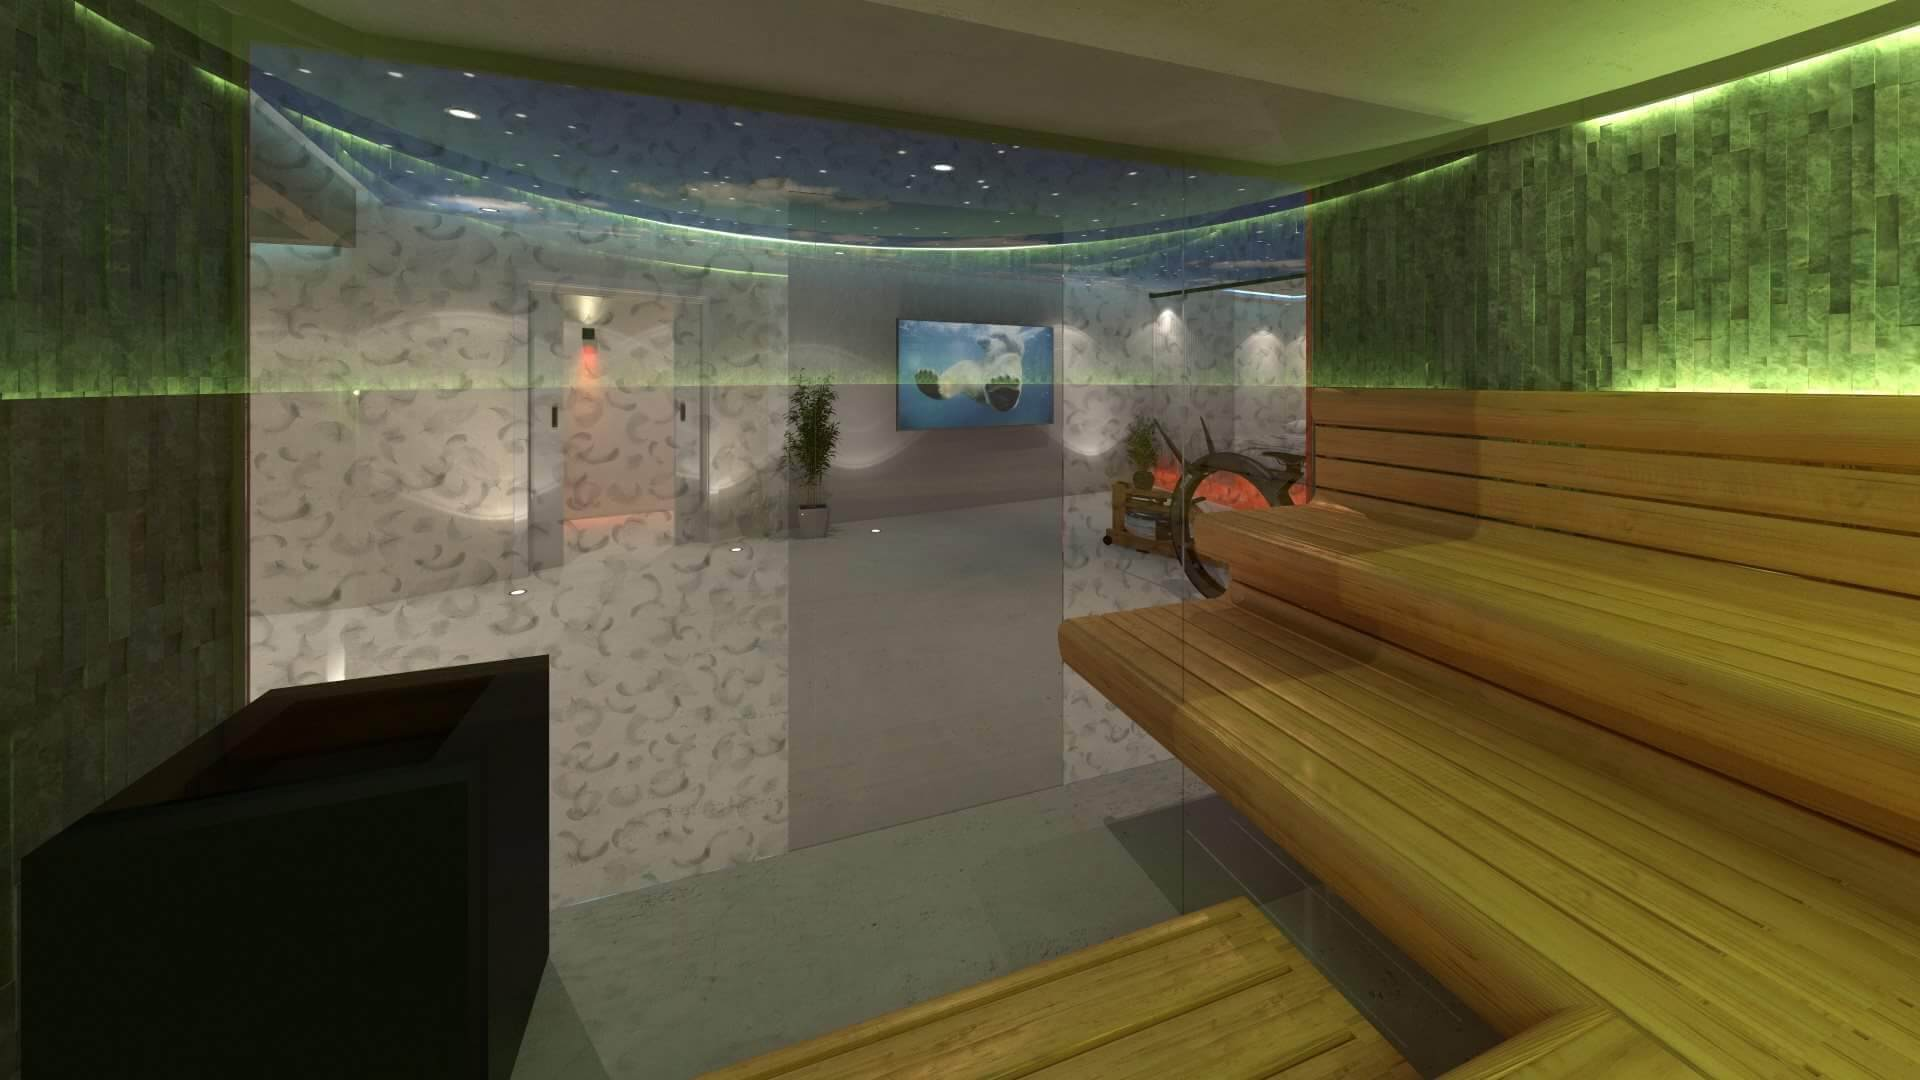 Spa design  Spa Design ▻ vom Designer Torsten Müller aus Bad Honnef ✓